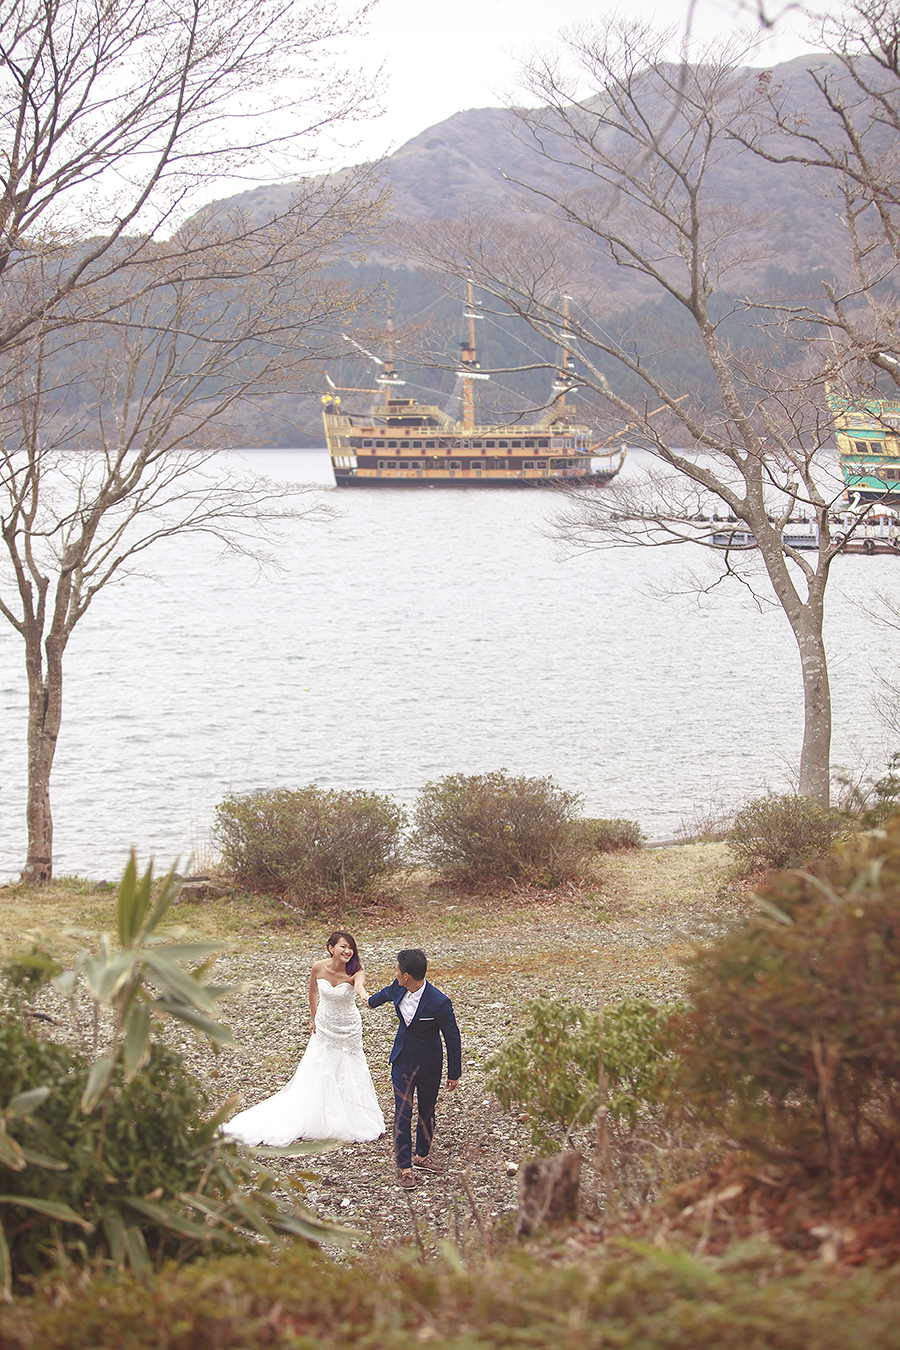 tokyo hakone japan spring sakura . engagement wedding photography by kurt ahs . ns + eu . 0383.jpg